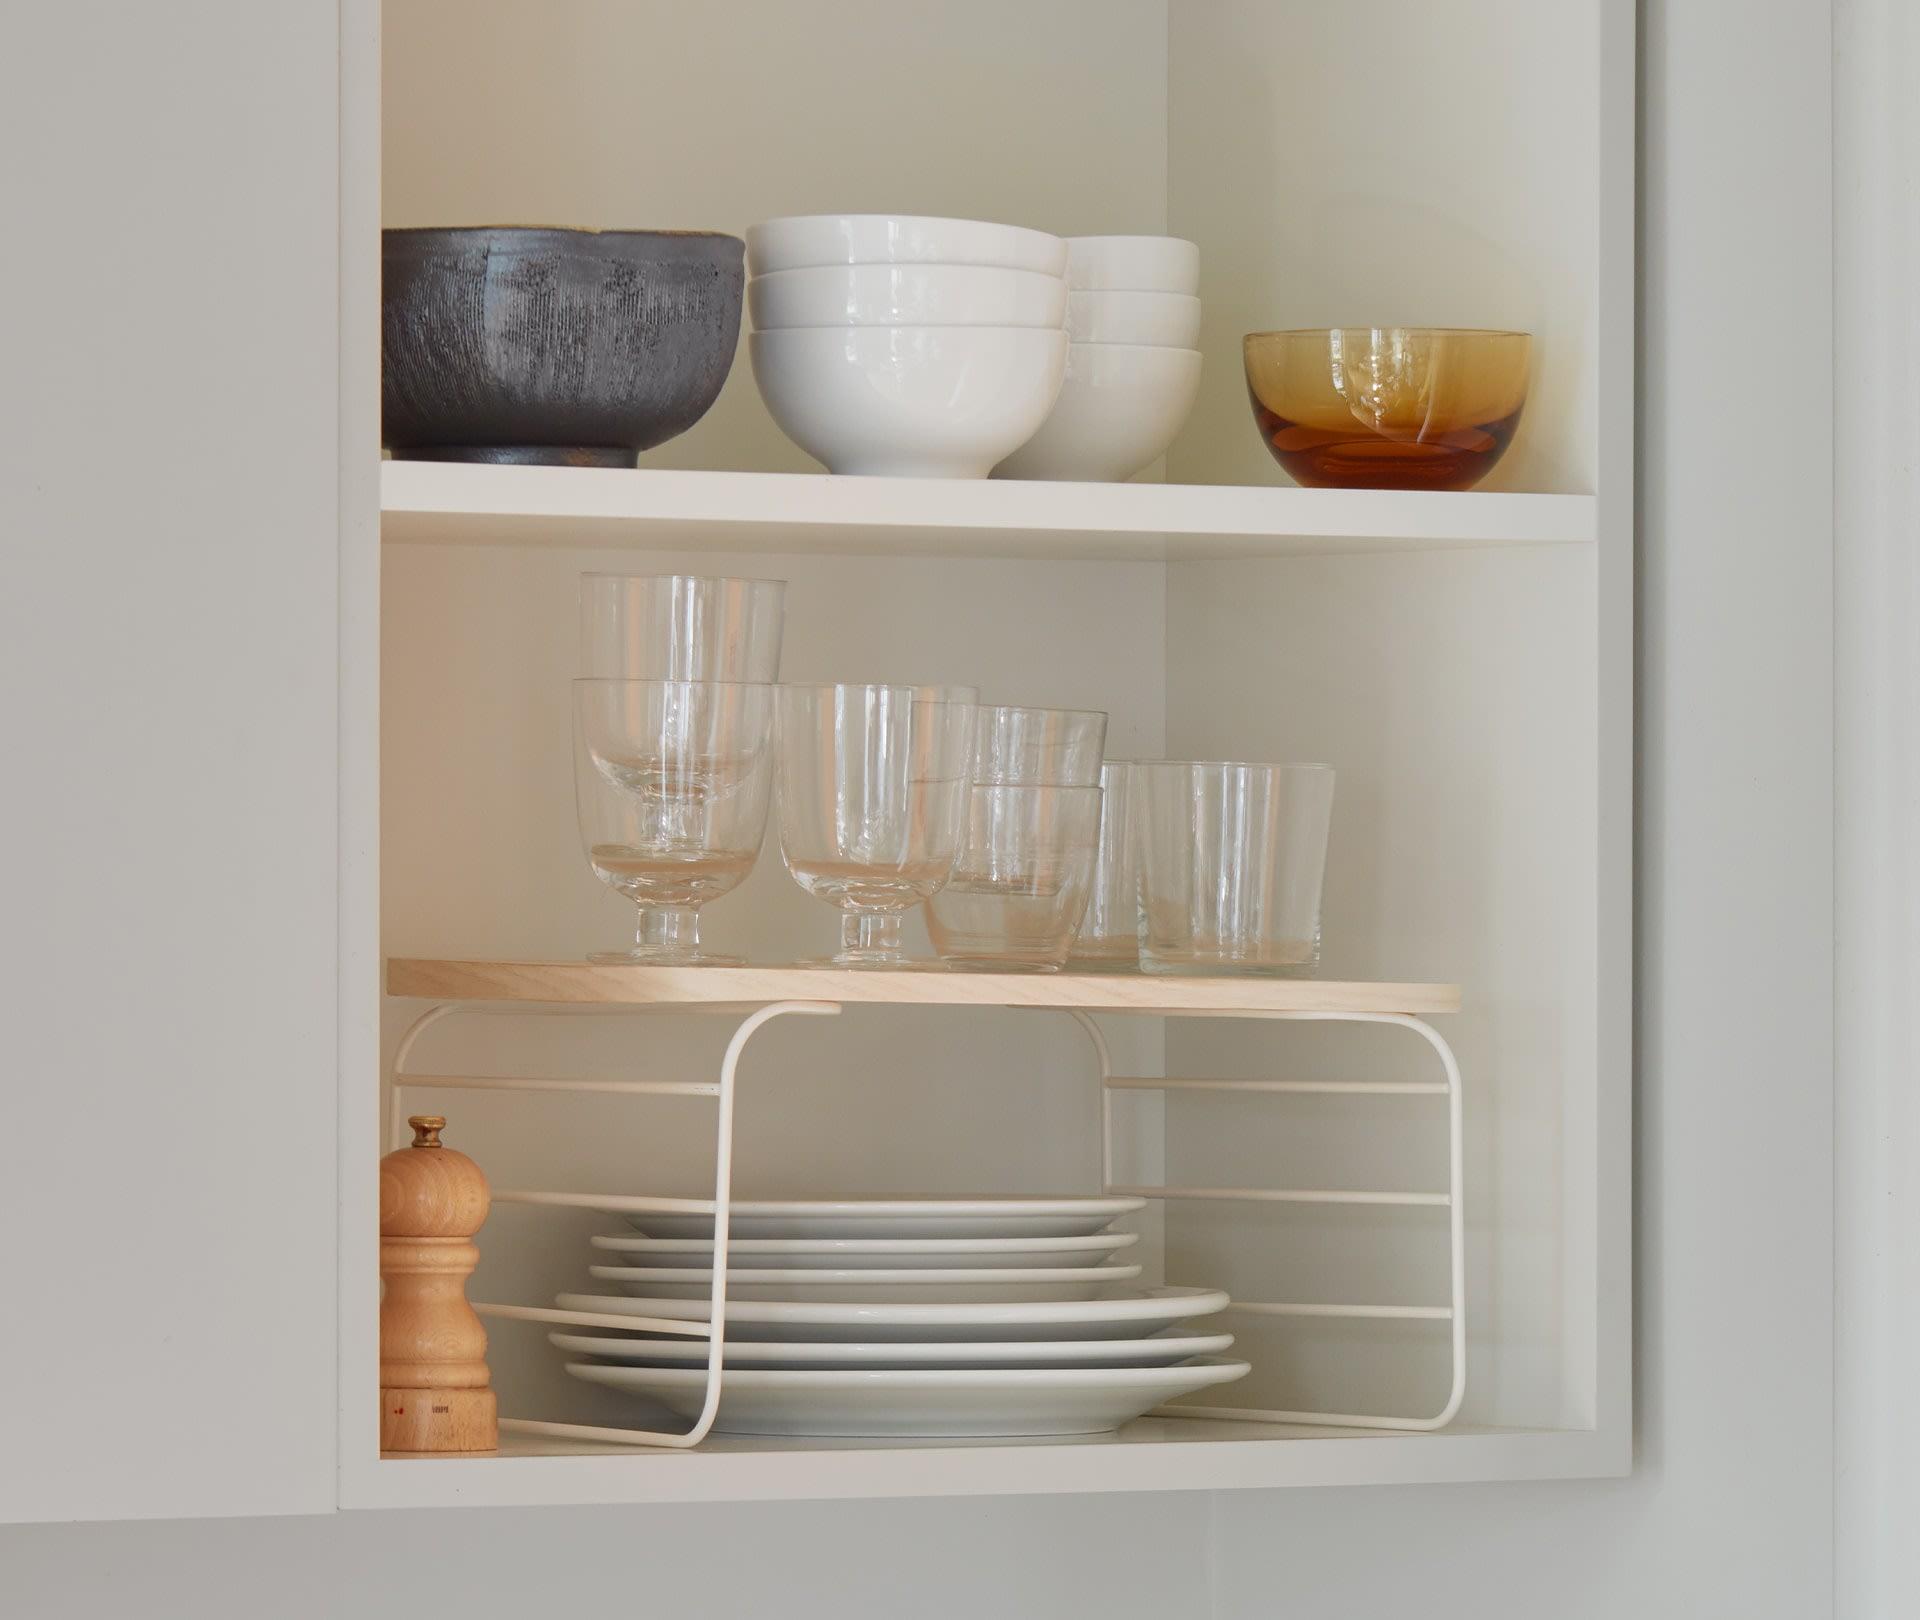 Kitchen cabinet with shelf riser